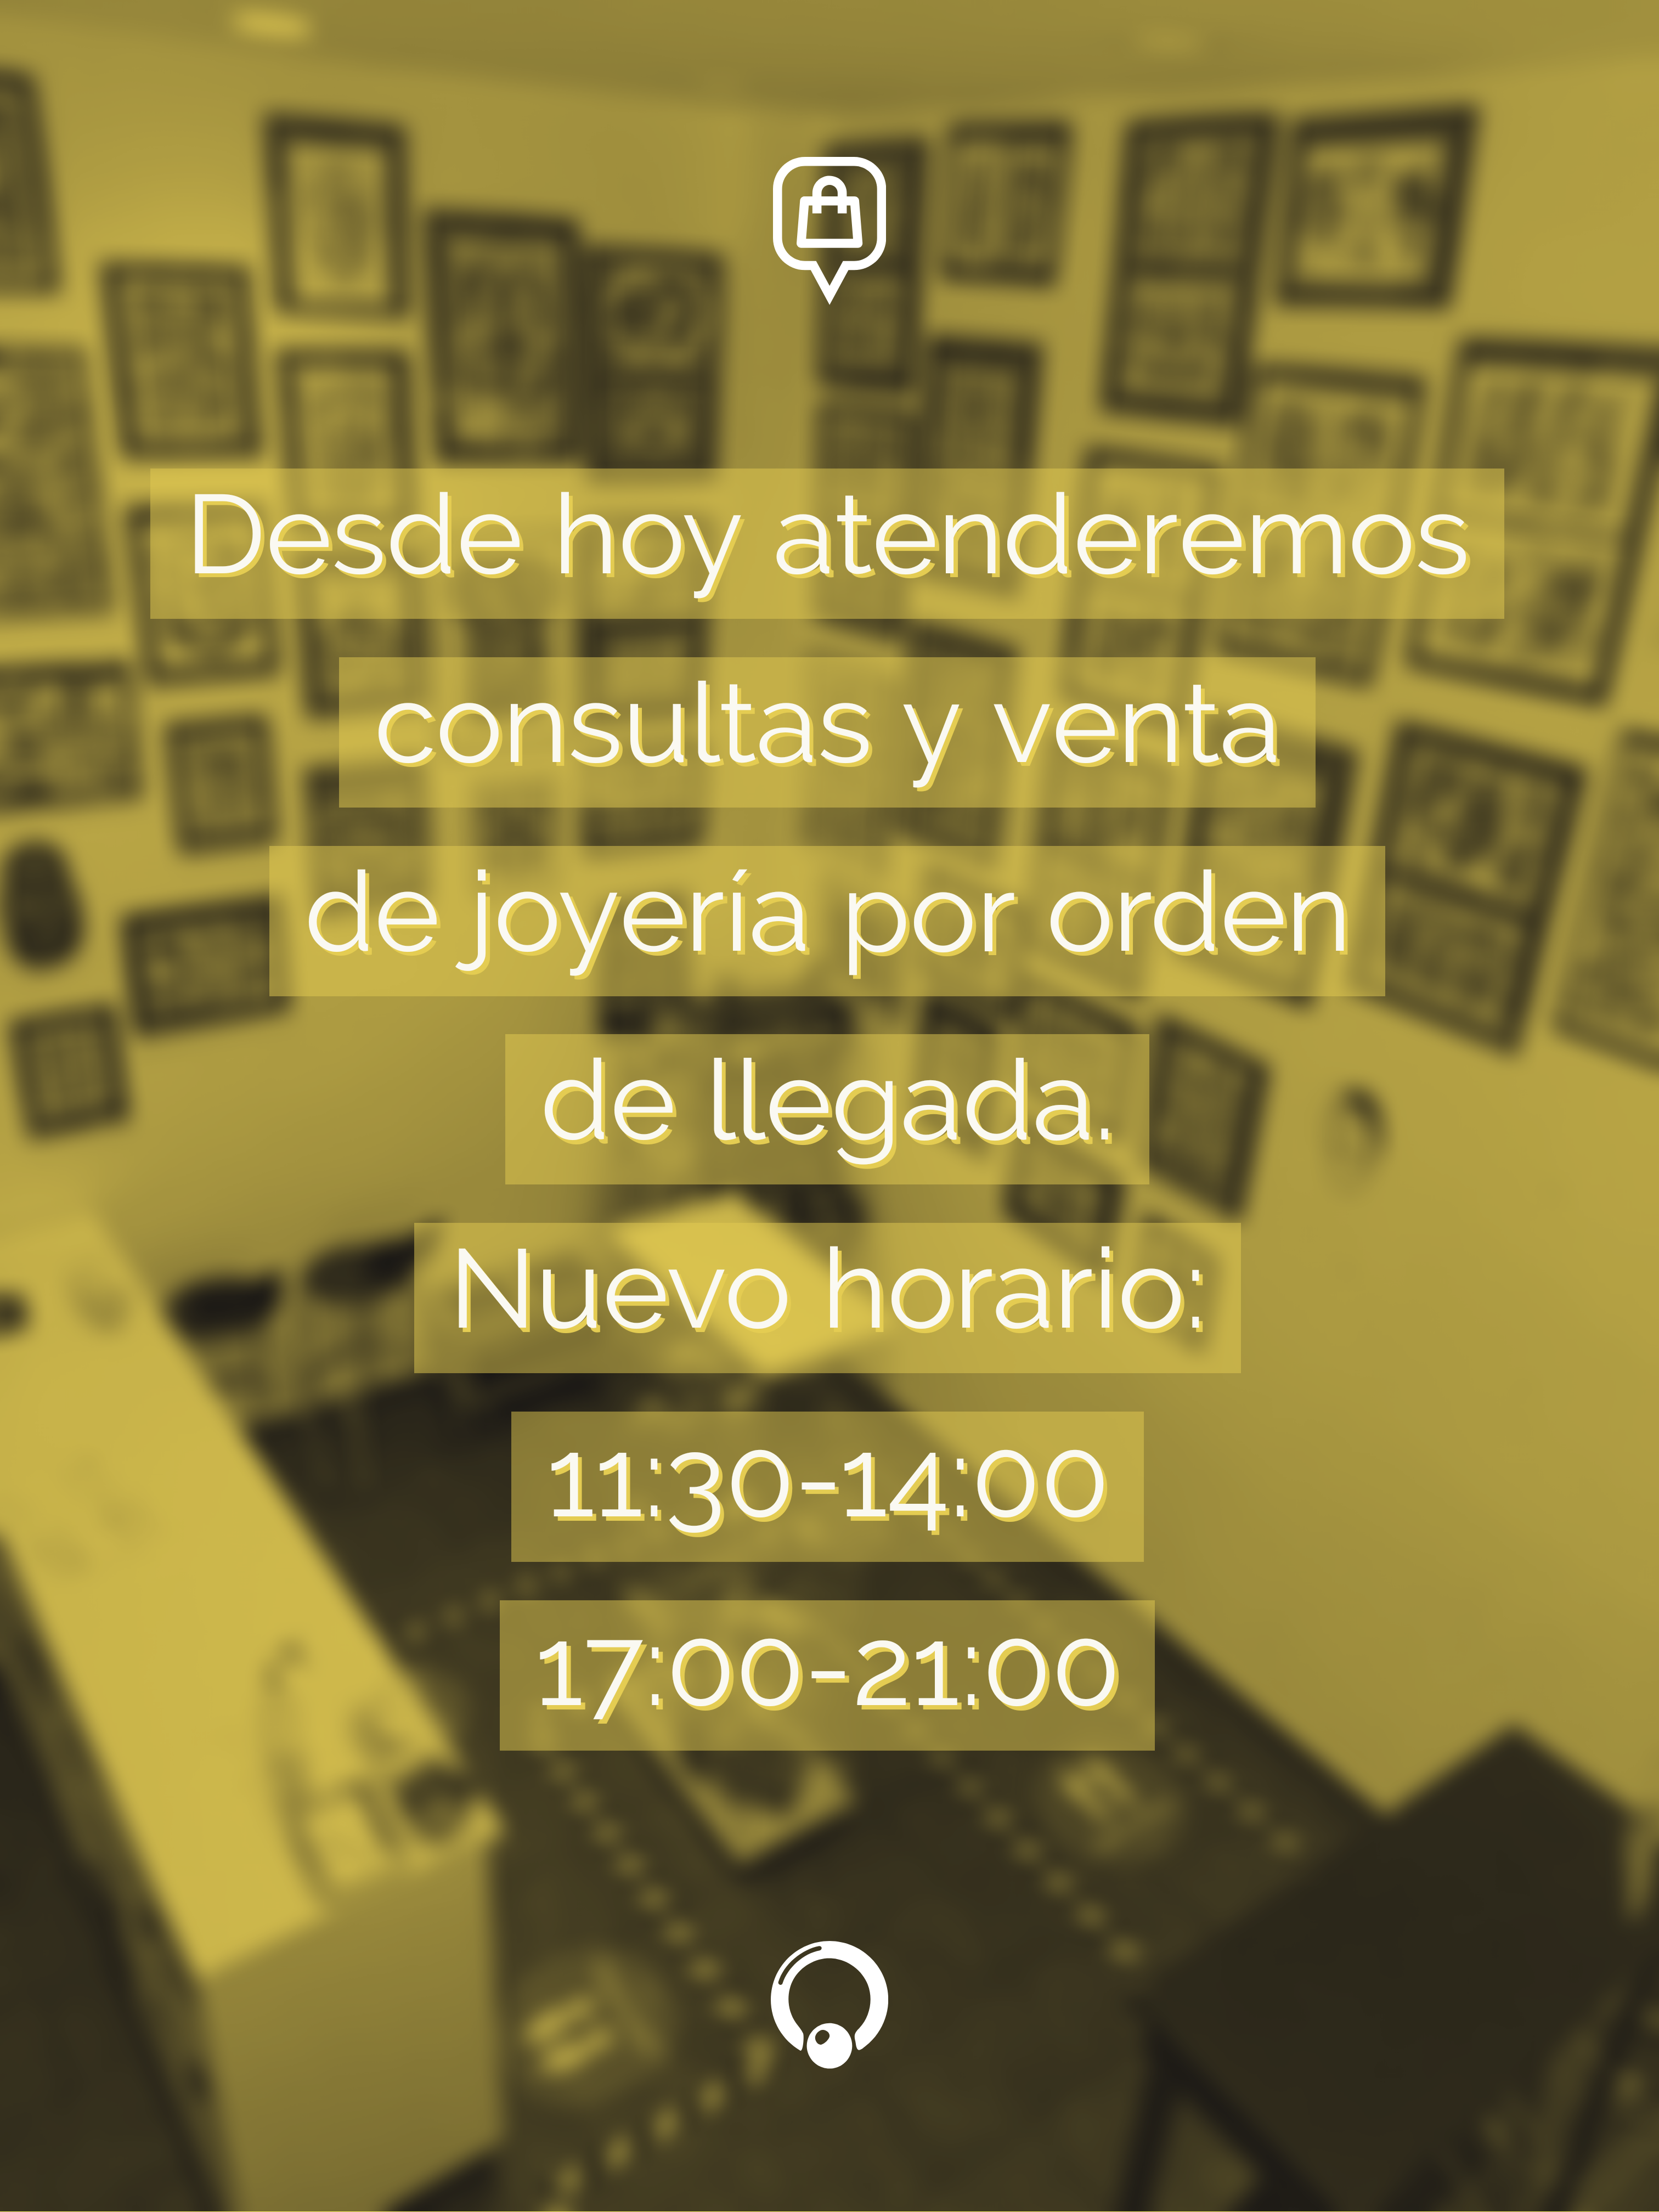 Adobe_Post_20200622_1310100.10408058609720039